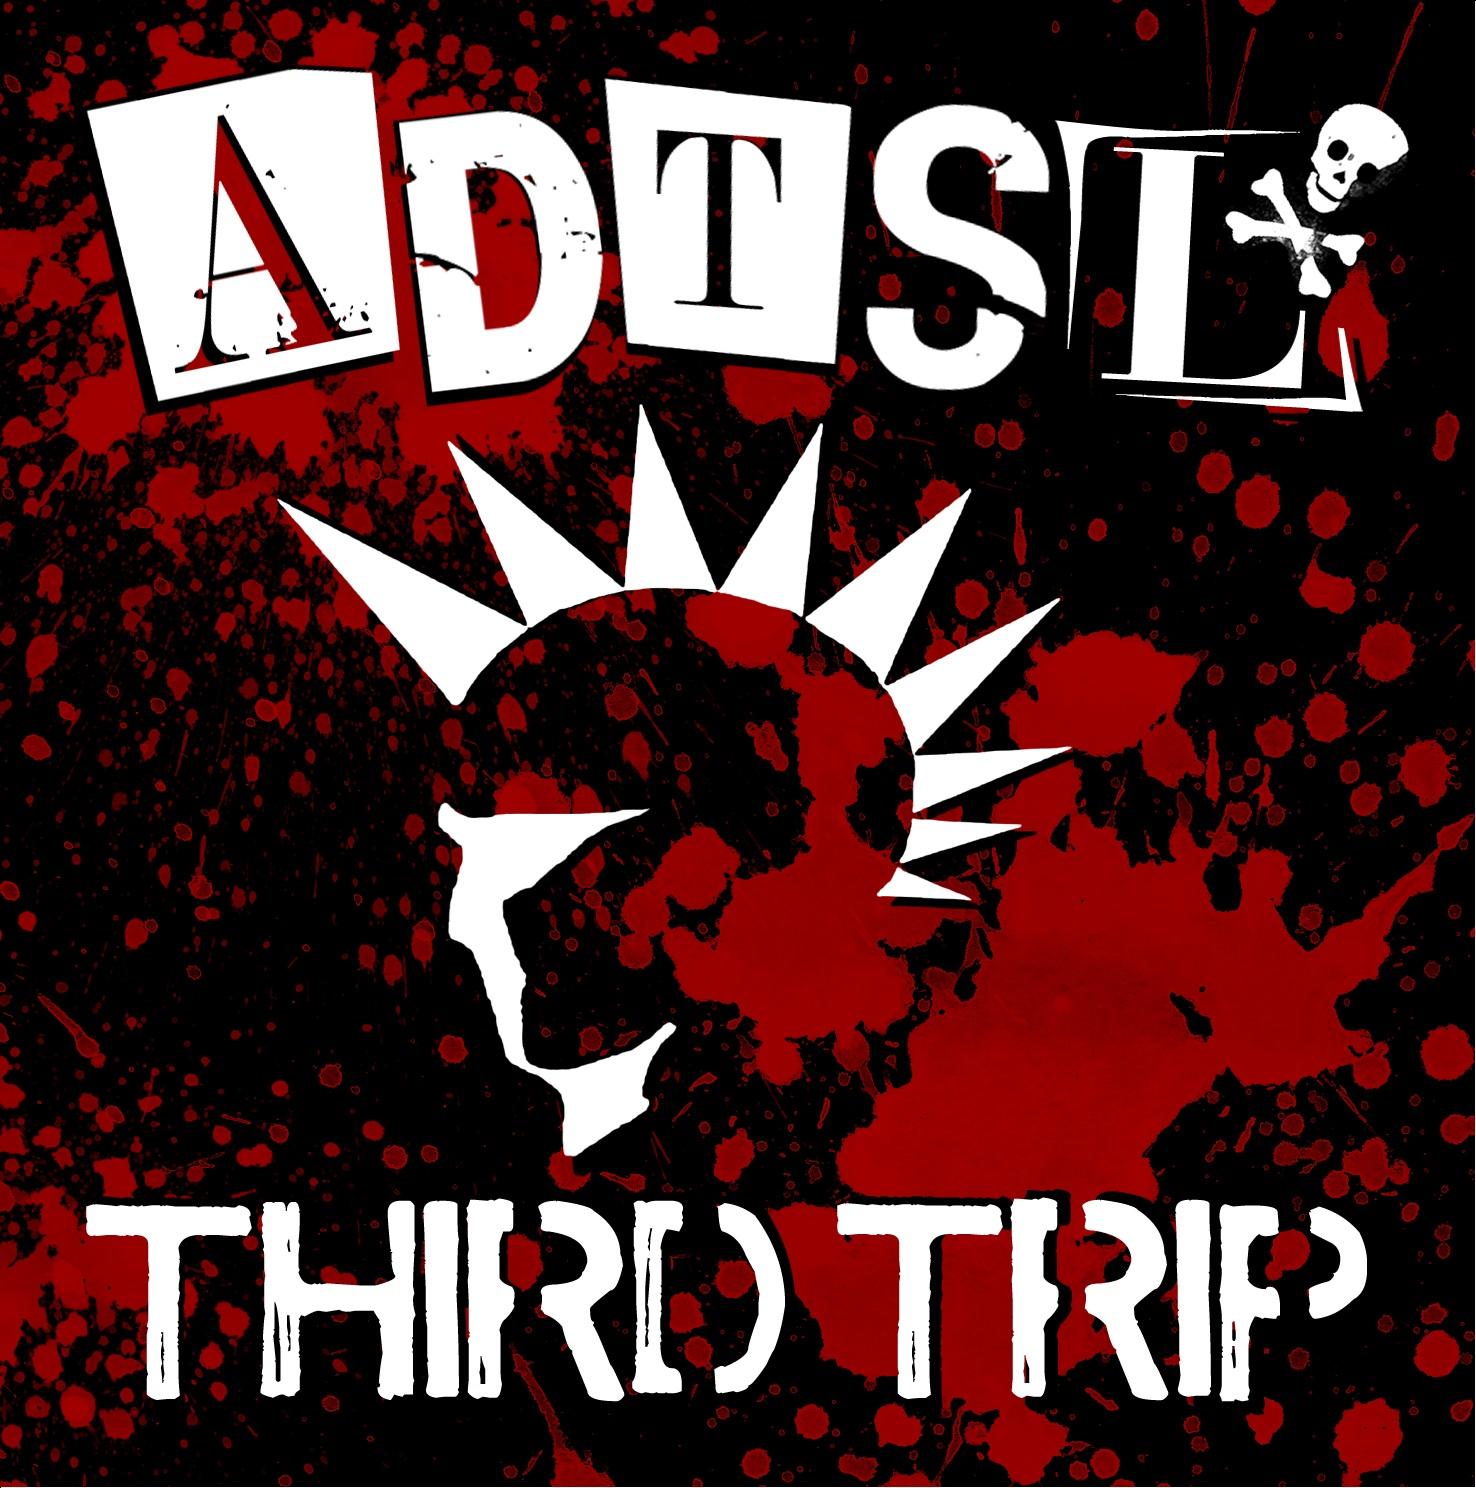 ADTSL - THIRD TRIP | IL NUOVO DISCO IN FREE DOWNLOAD